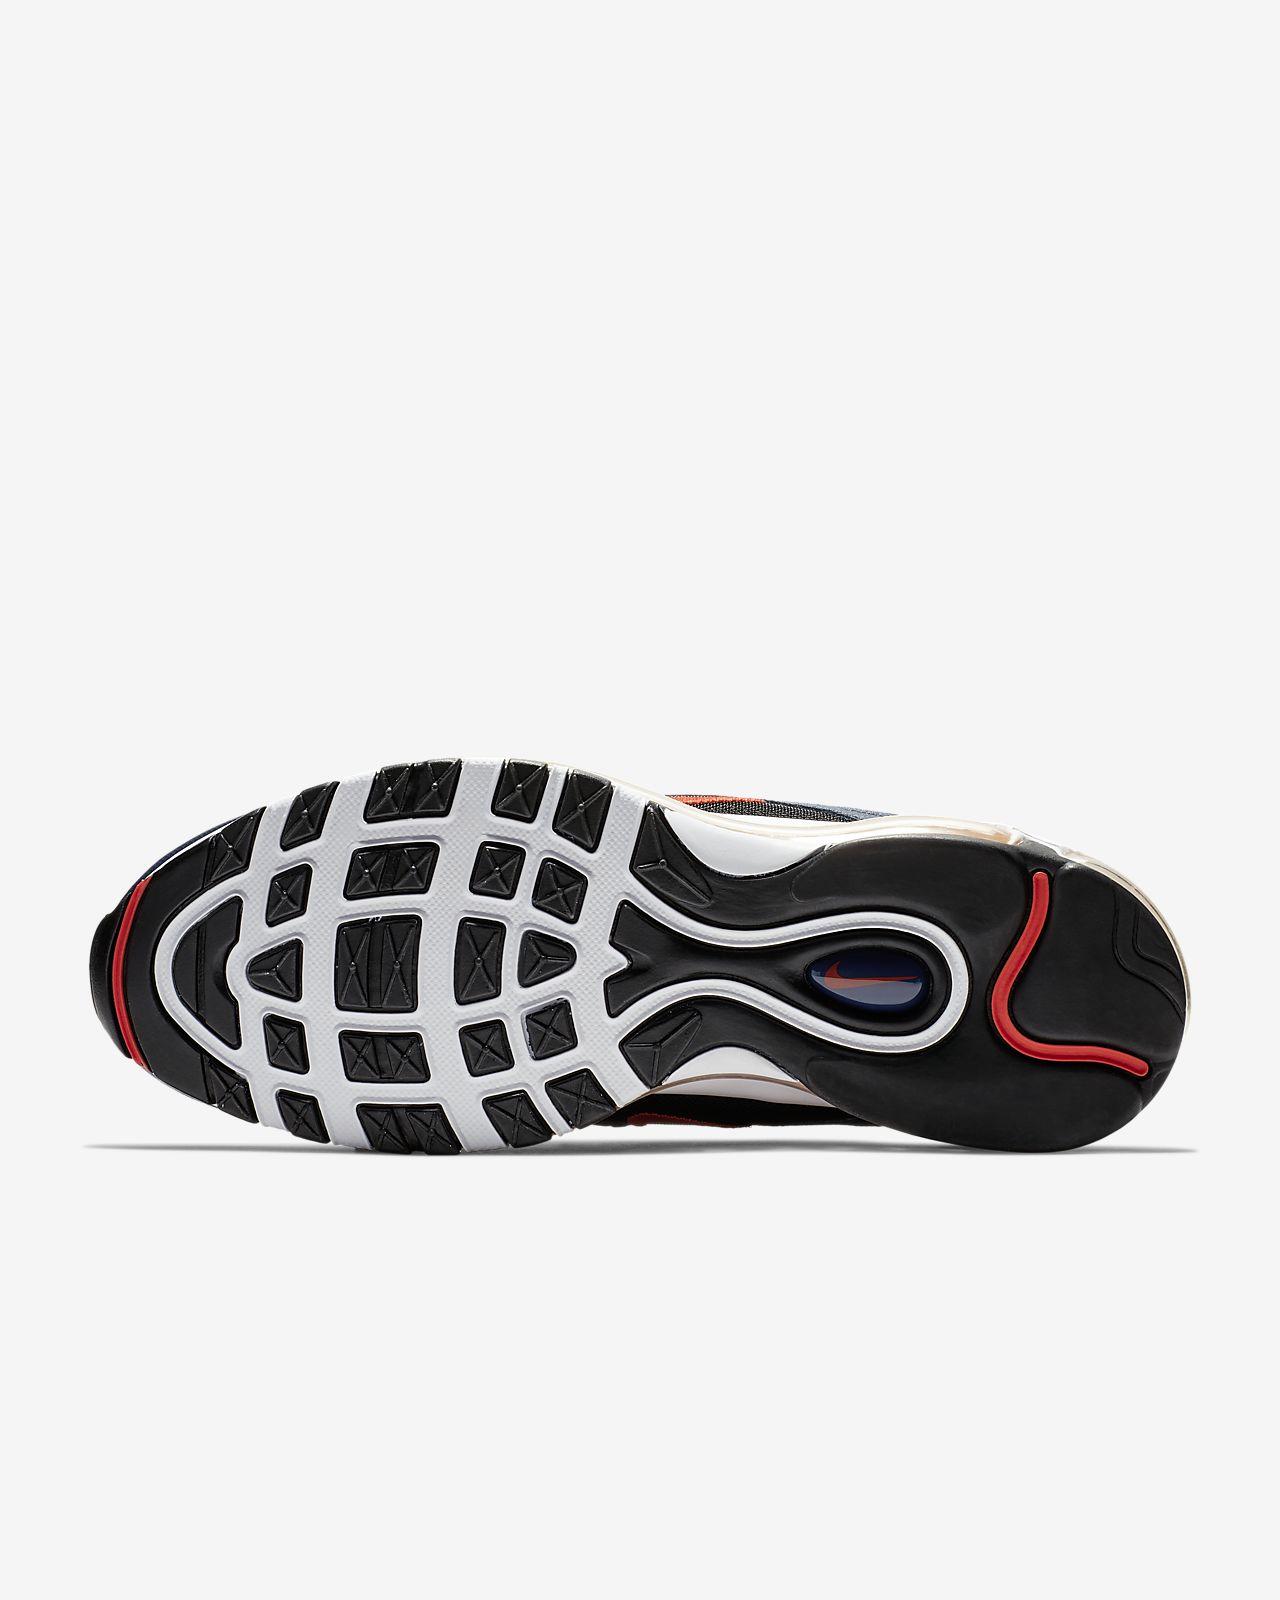 sports shoes 081cb 79771 official store air jordan retro 4 herren basketball schuhe black grey red  großhandel günstige nike ce92e c45b1  france nike air max 97 herrenschuh  254a2 ...